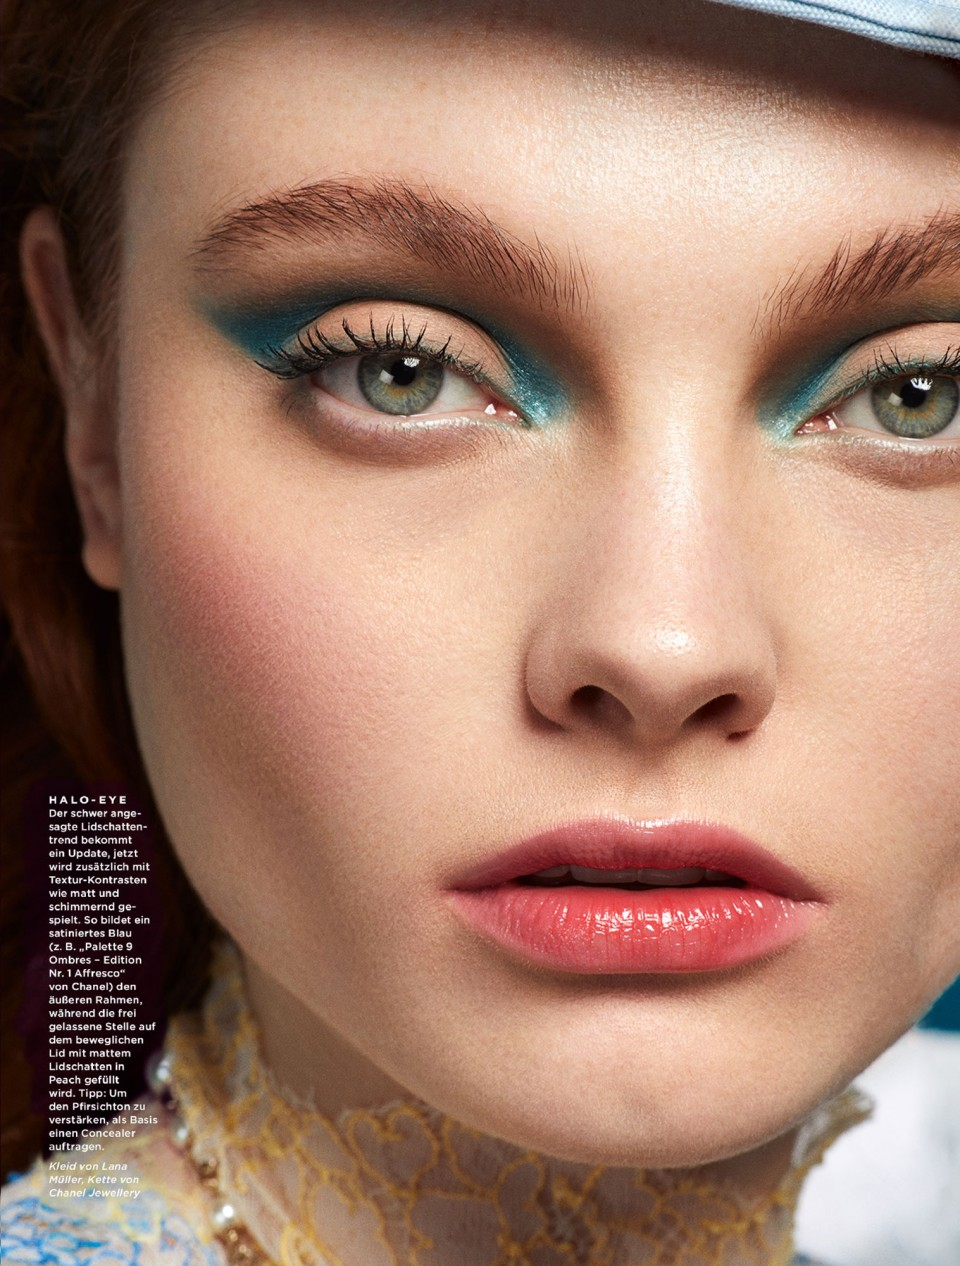 Frauke Fischer – Cosmopola – Chanel Advertorial, Gala Beauty